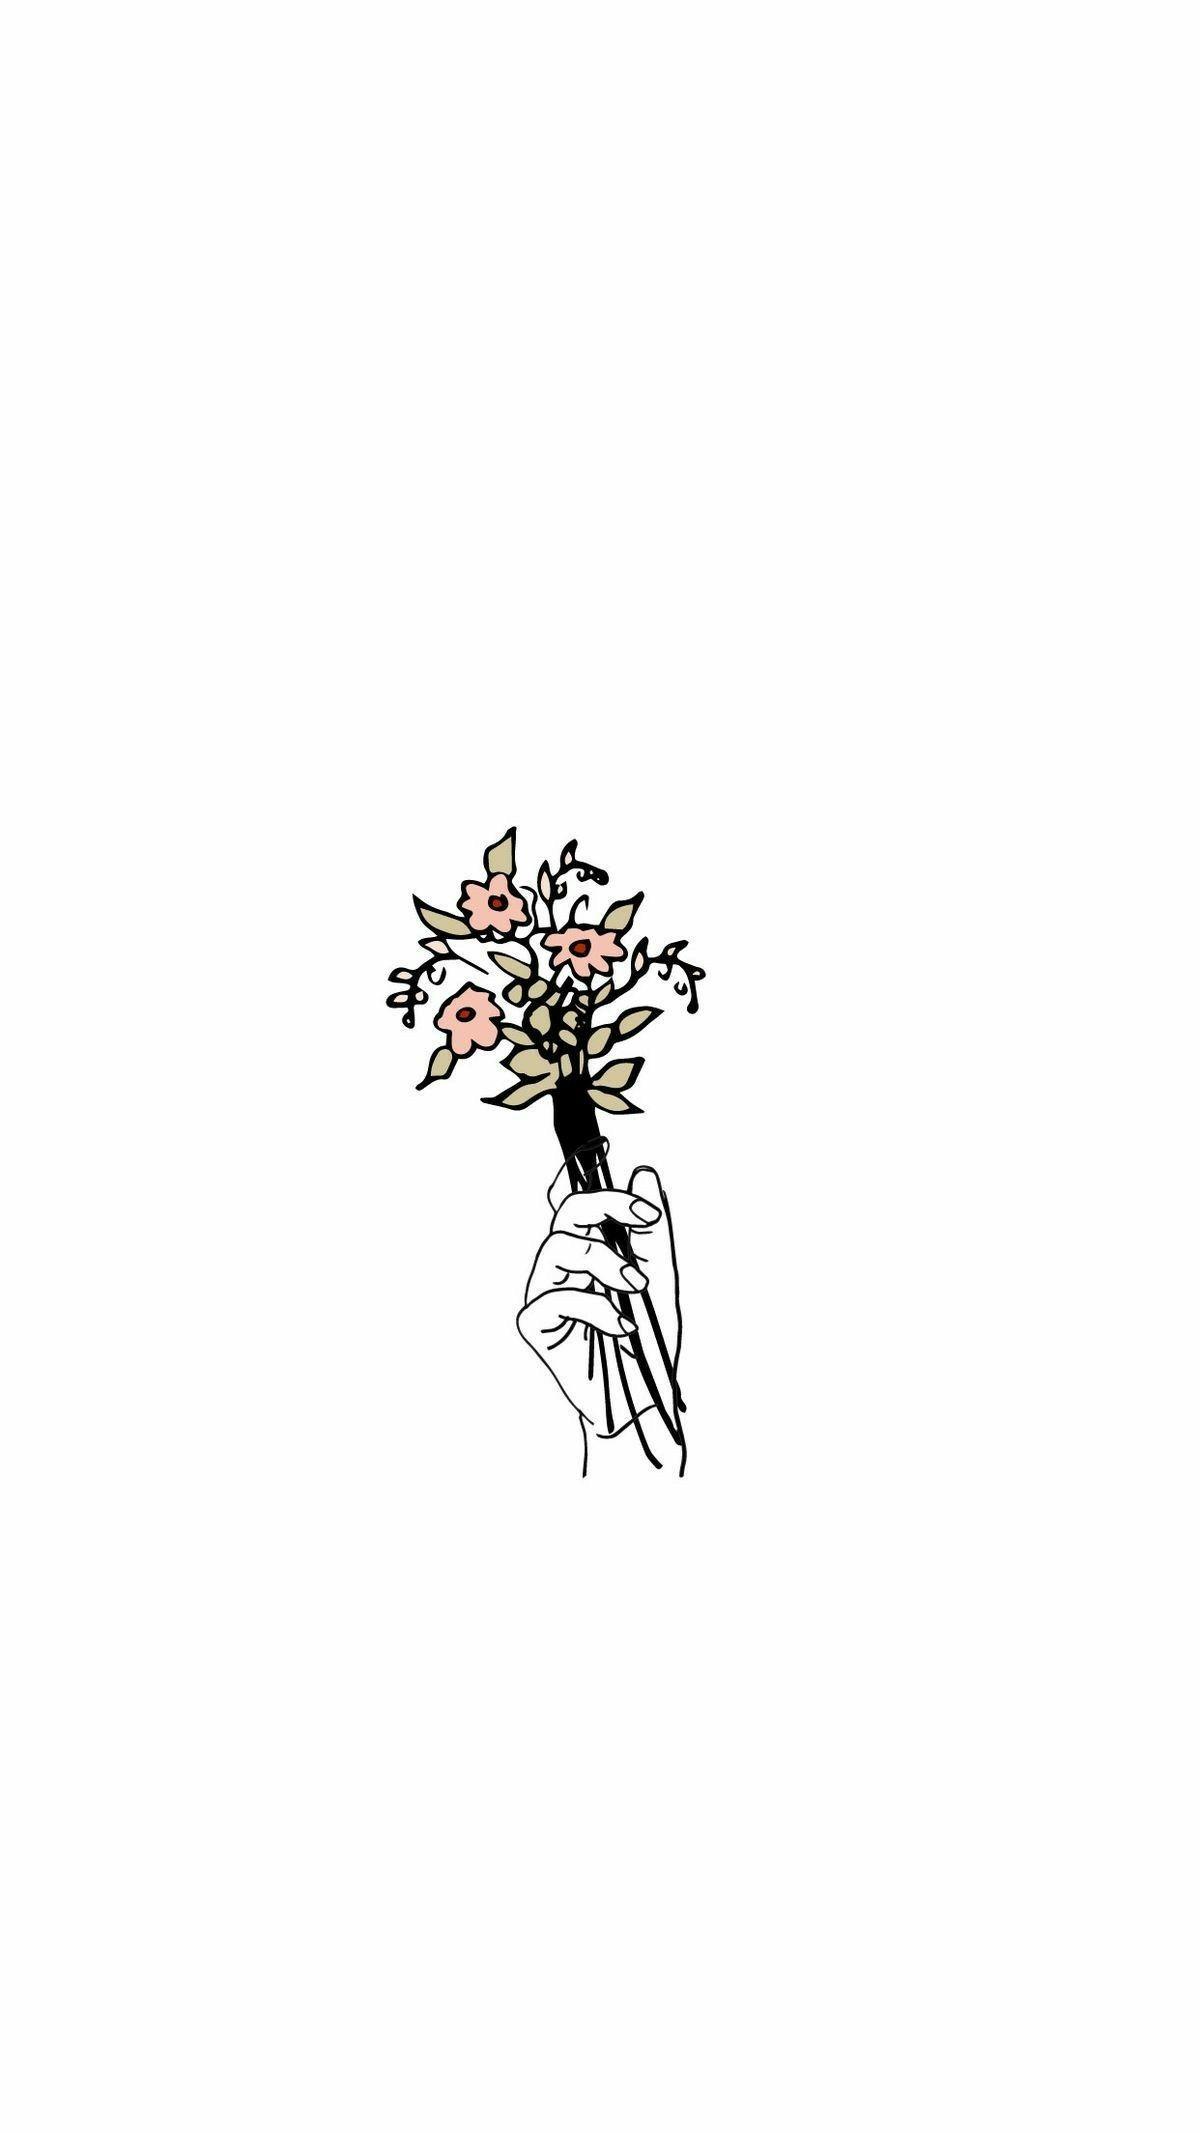 Minimalist Flower Wallpapers Top Free Minimalist Flower